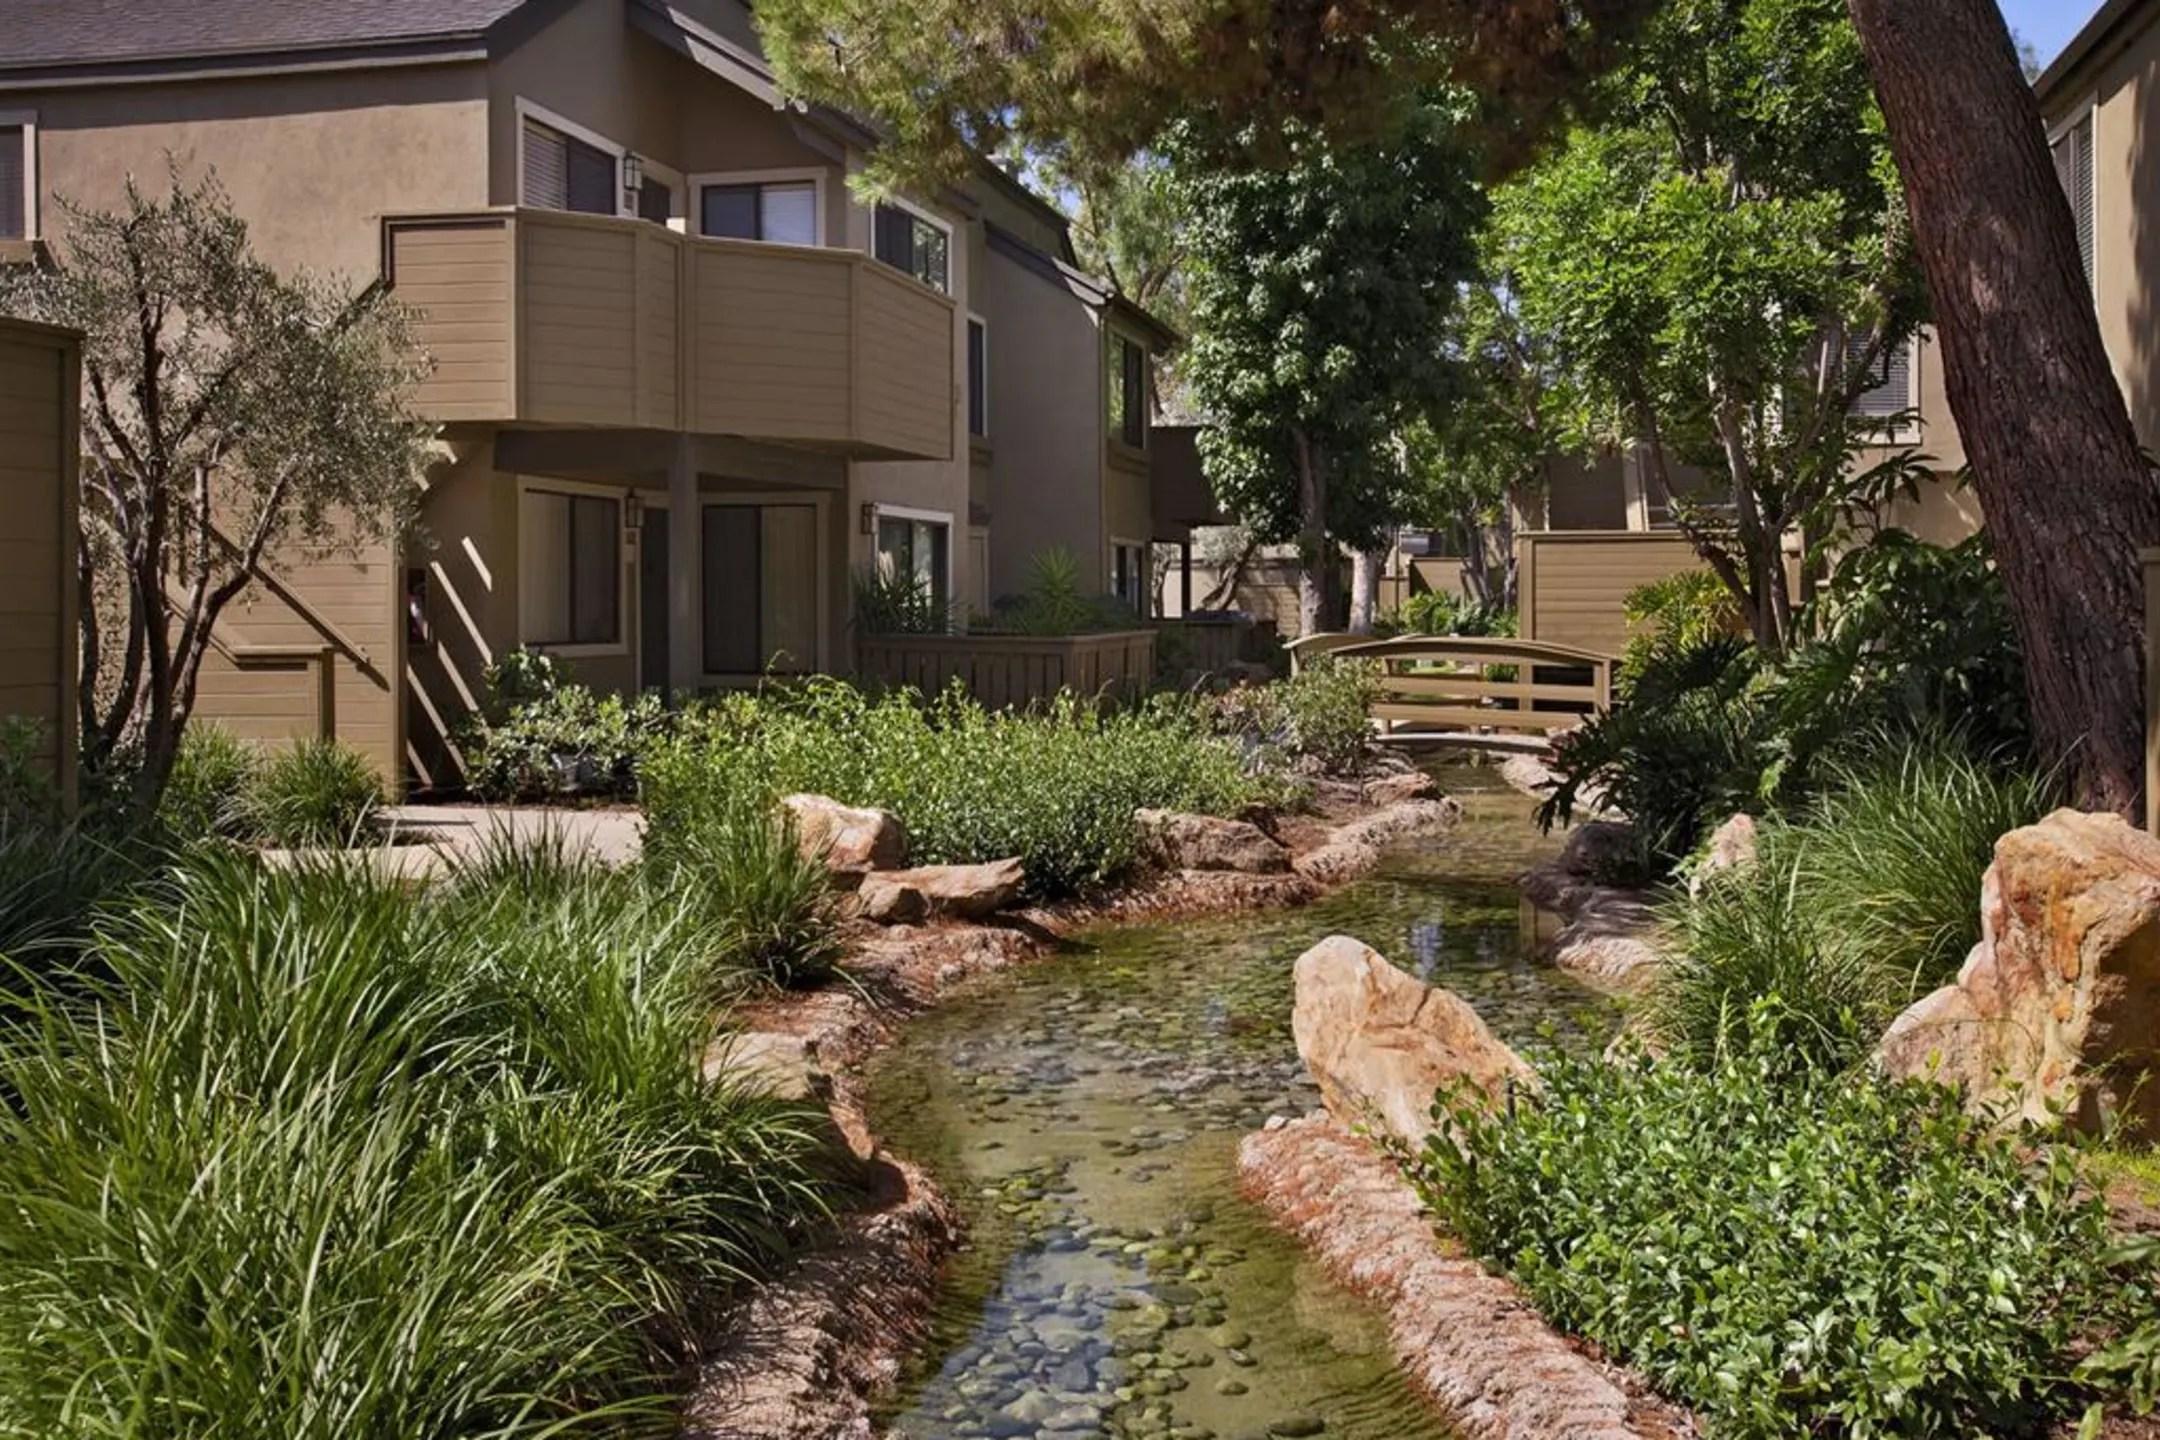 Woodbridge Apartments Irvine CA 92604